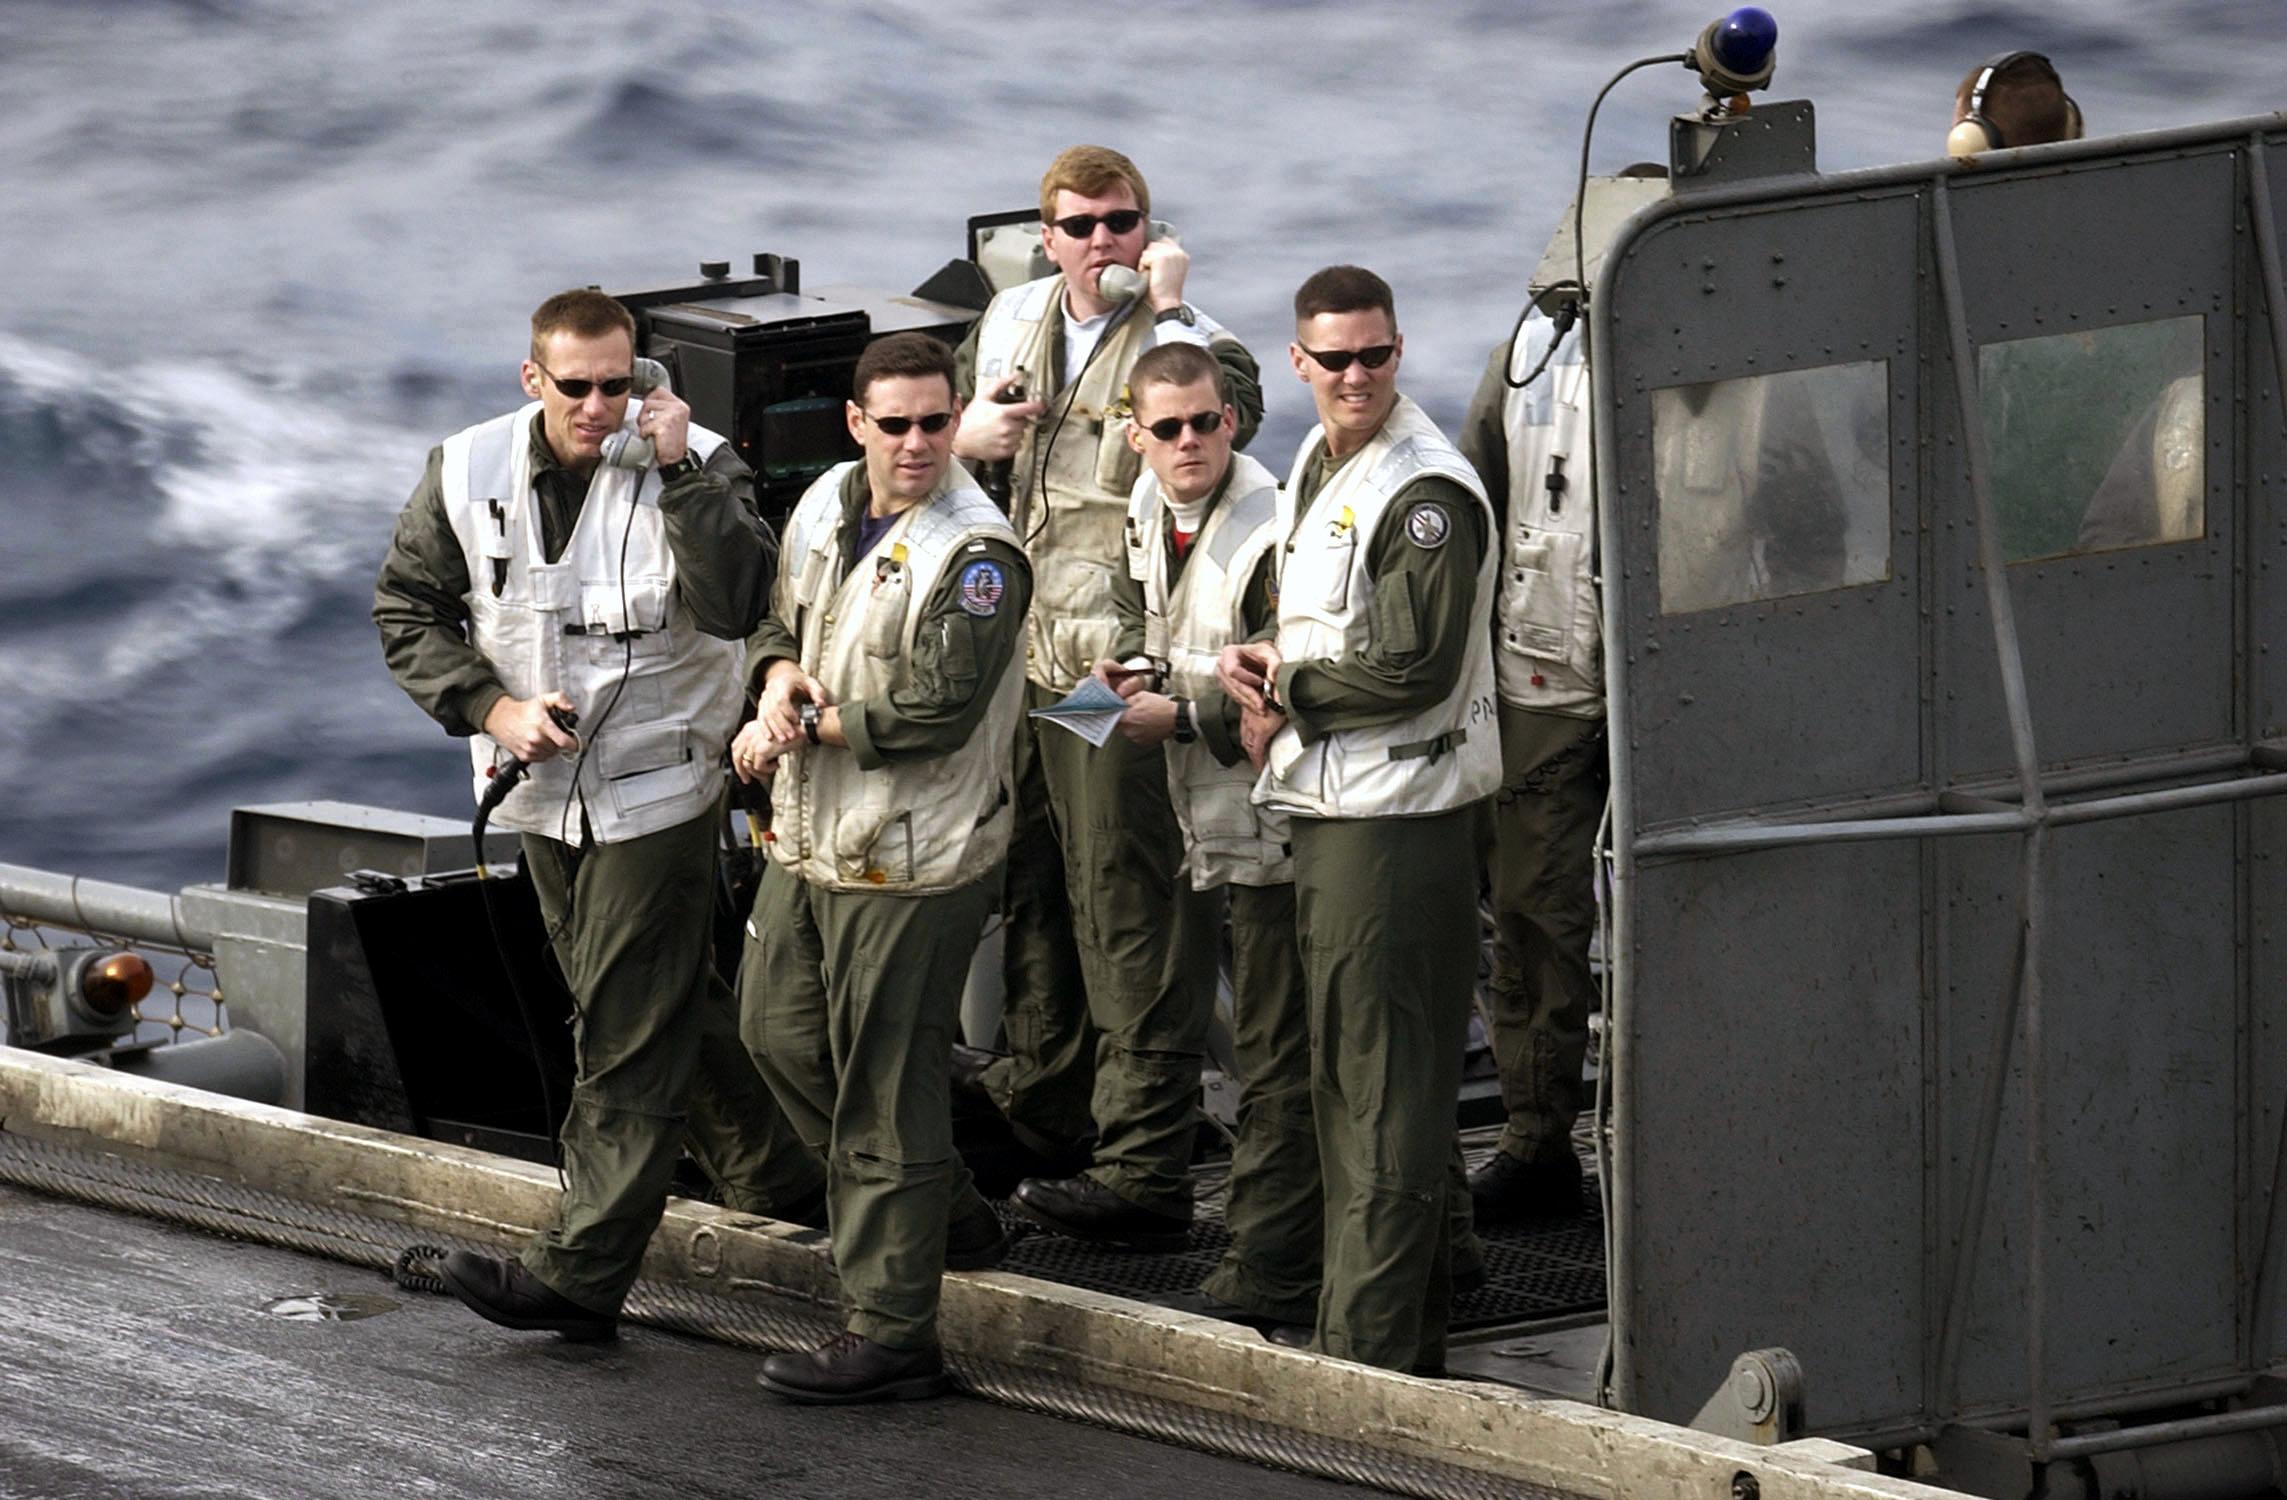 US_Navy_030212-N-4308O-066_Landing_Signal_Officers_evaluate_the_landing_of_an_aircraft_aboard_the_USS_Harry_S._Truman_%28CVN_75%29.jpg